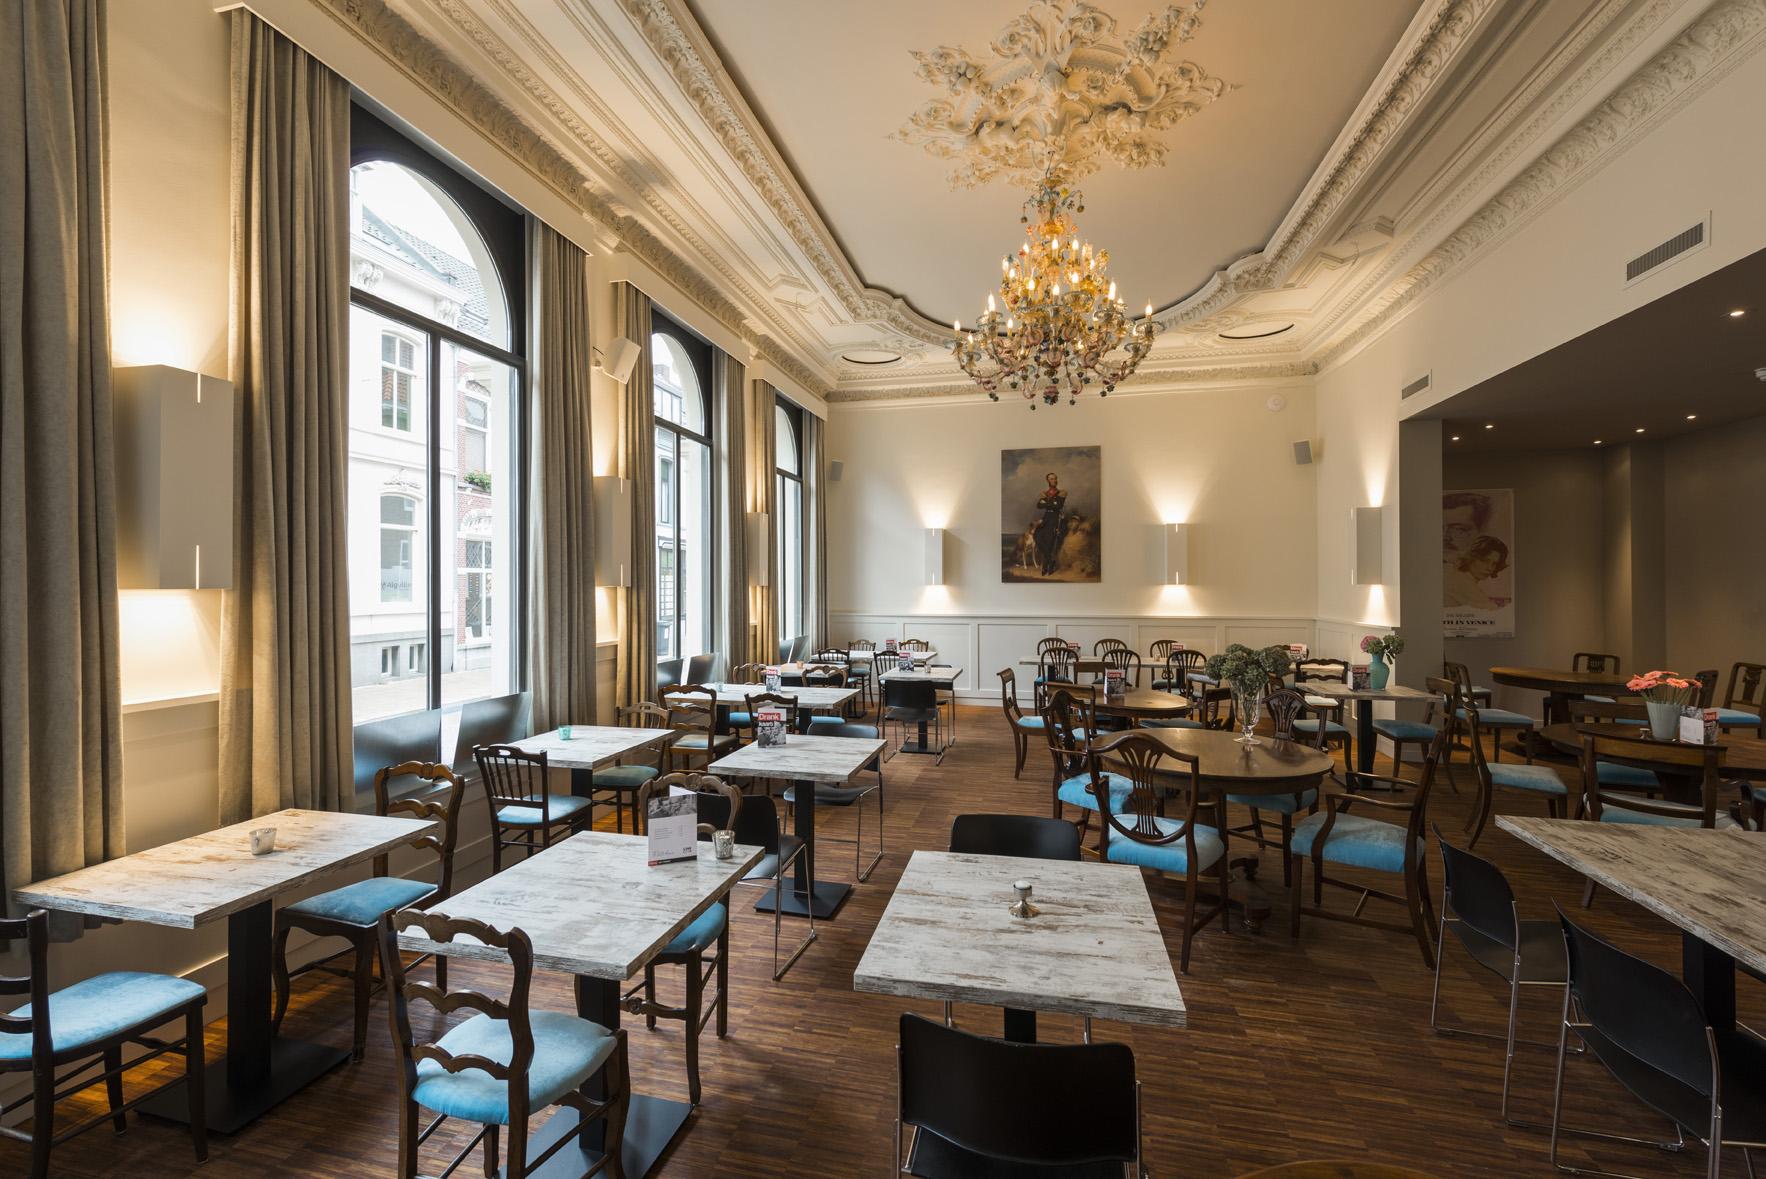 sm_Cinecitta_tilburg11_restaurant.jpg